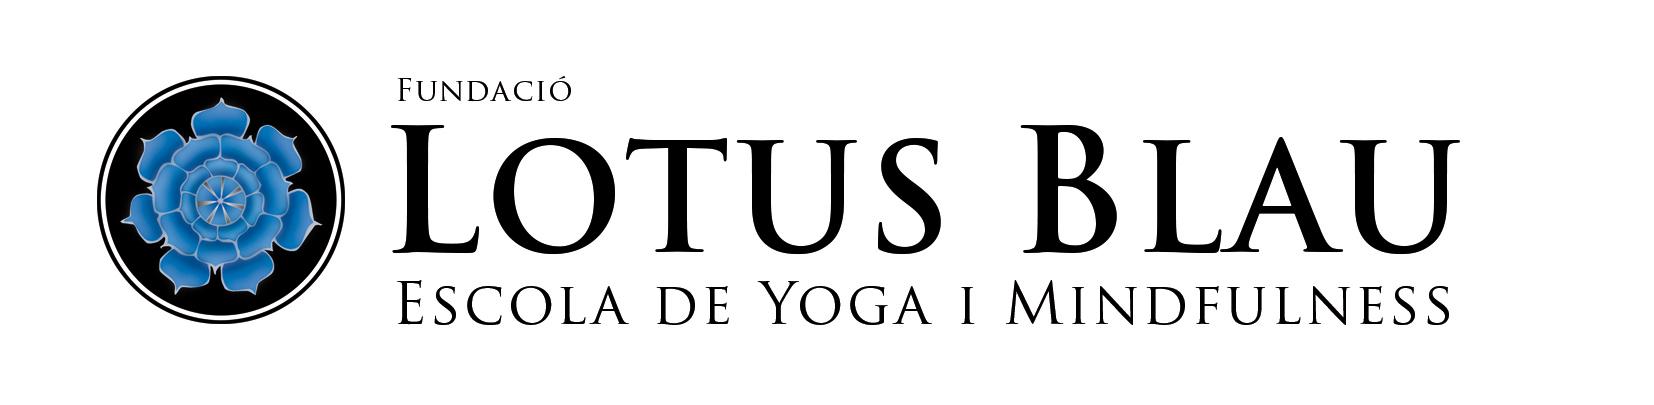 Fundació Lotus Blau